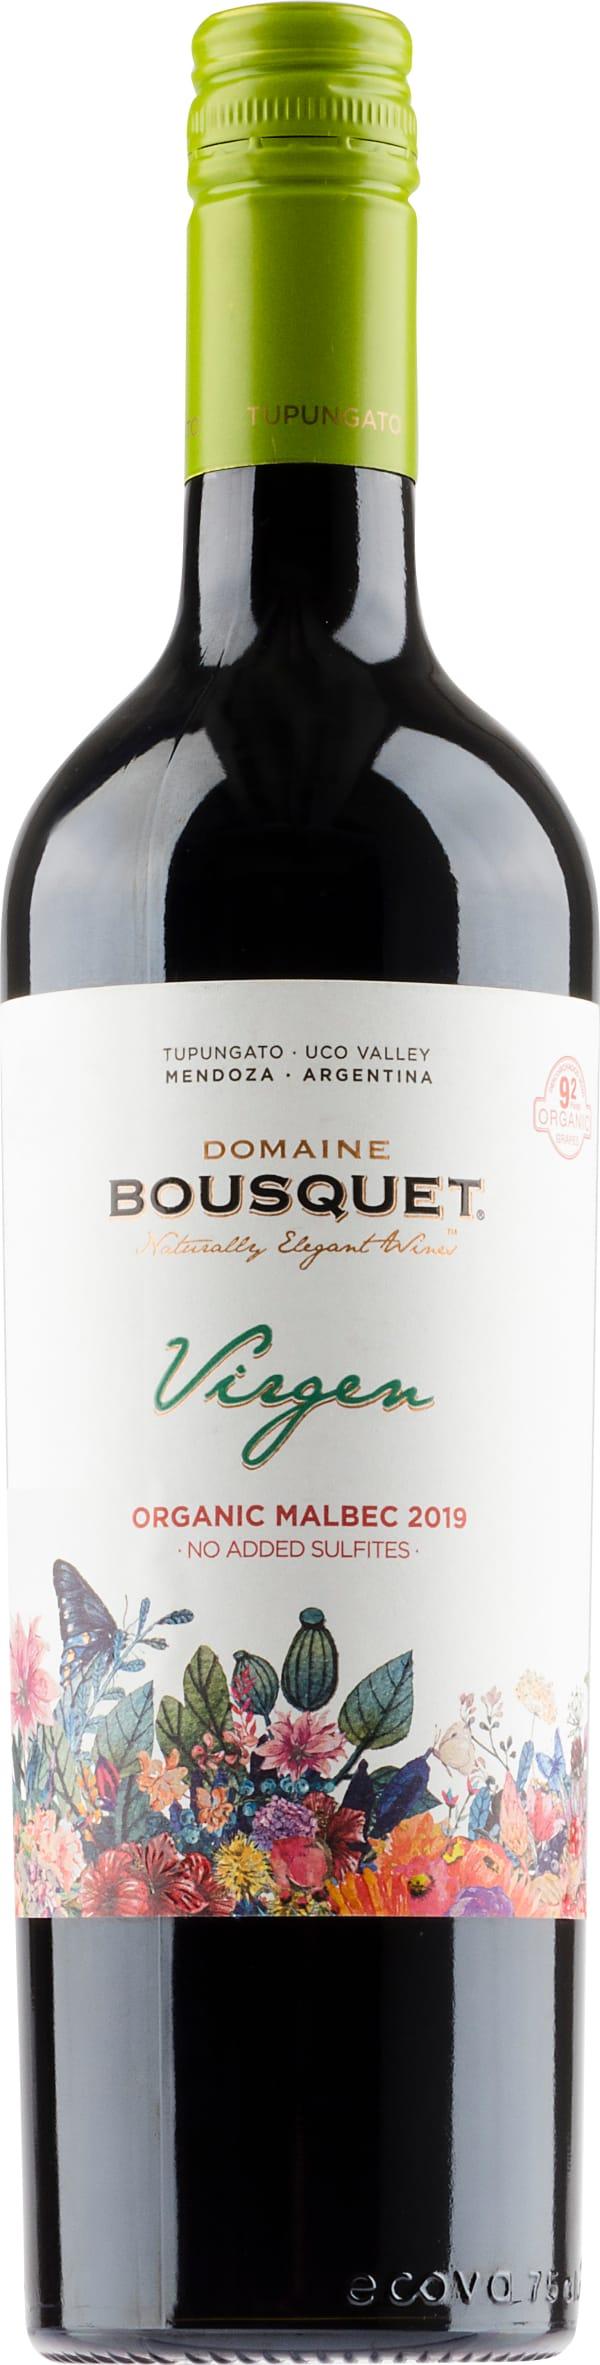 Domaine Bousquet Virgen Organic Malbec 2019